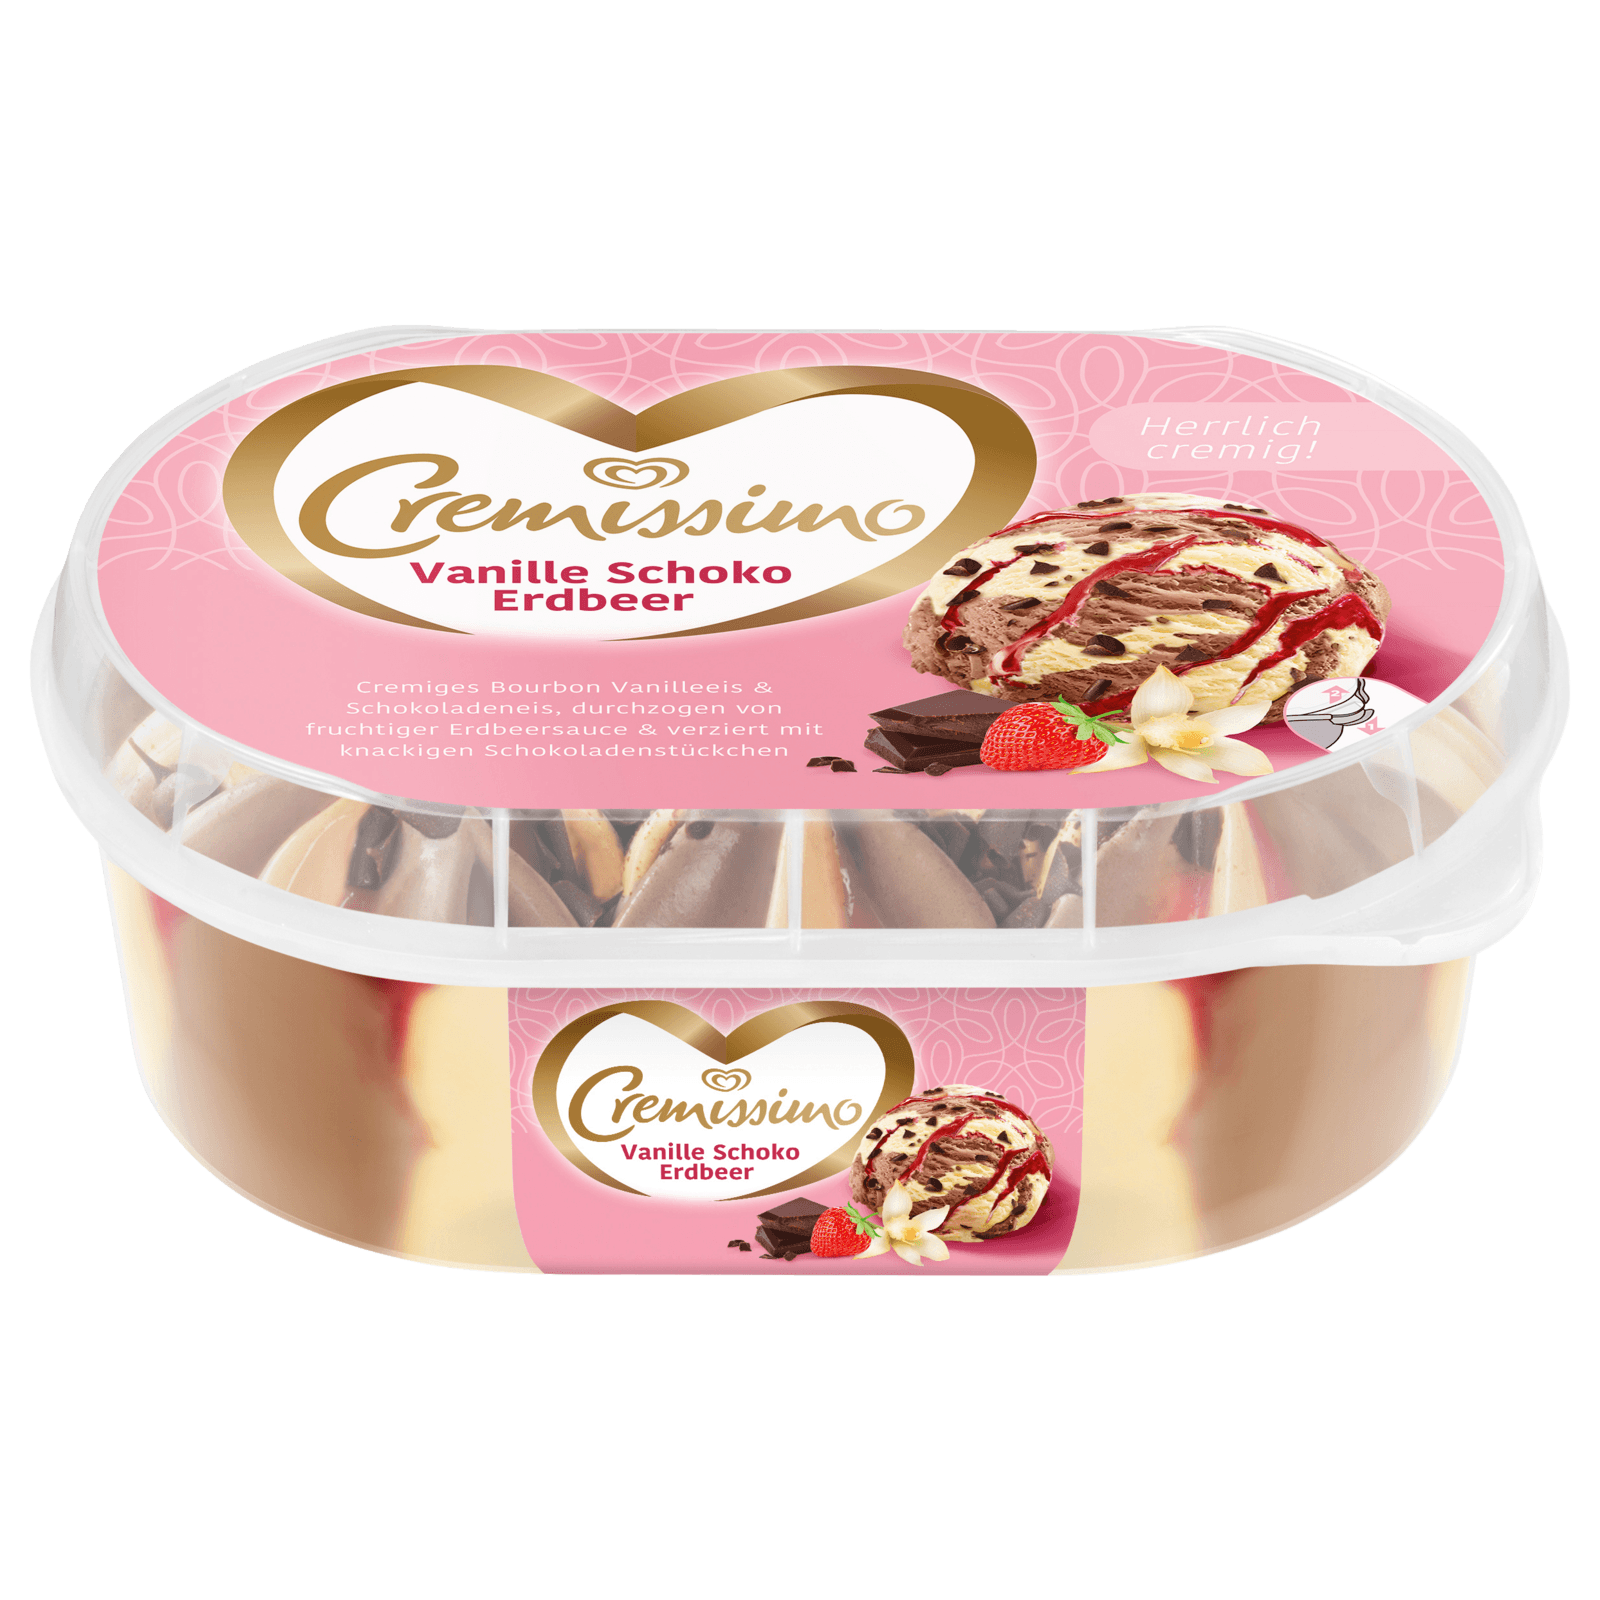 Cremissimo Vanille Schoko Erdbeer Eis 900 ml